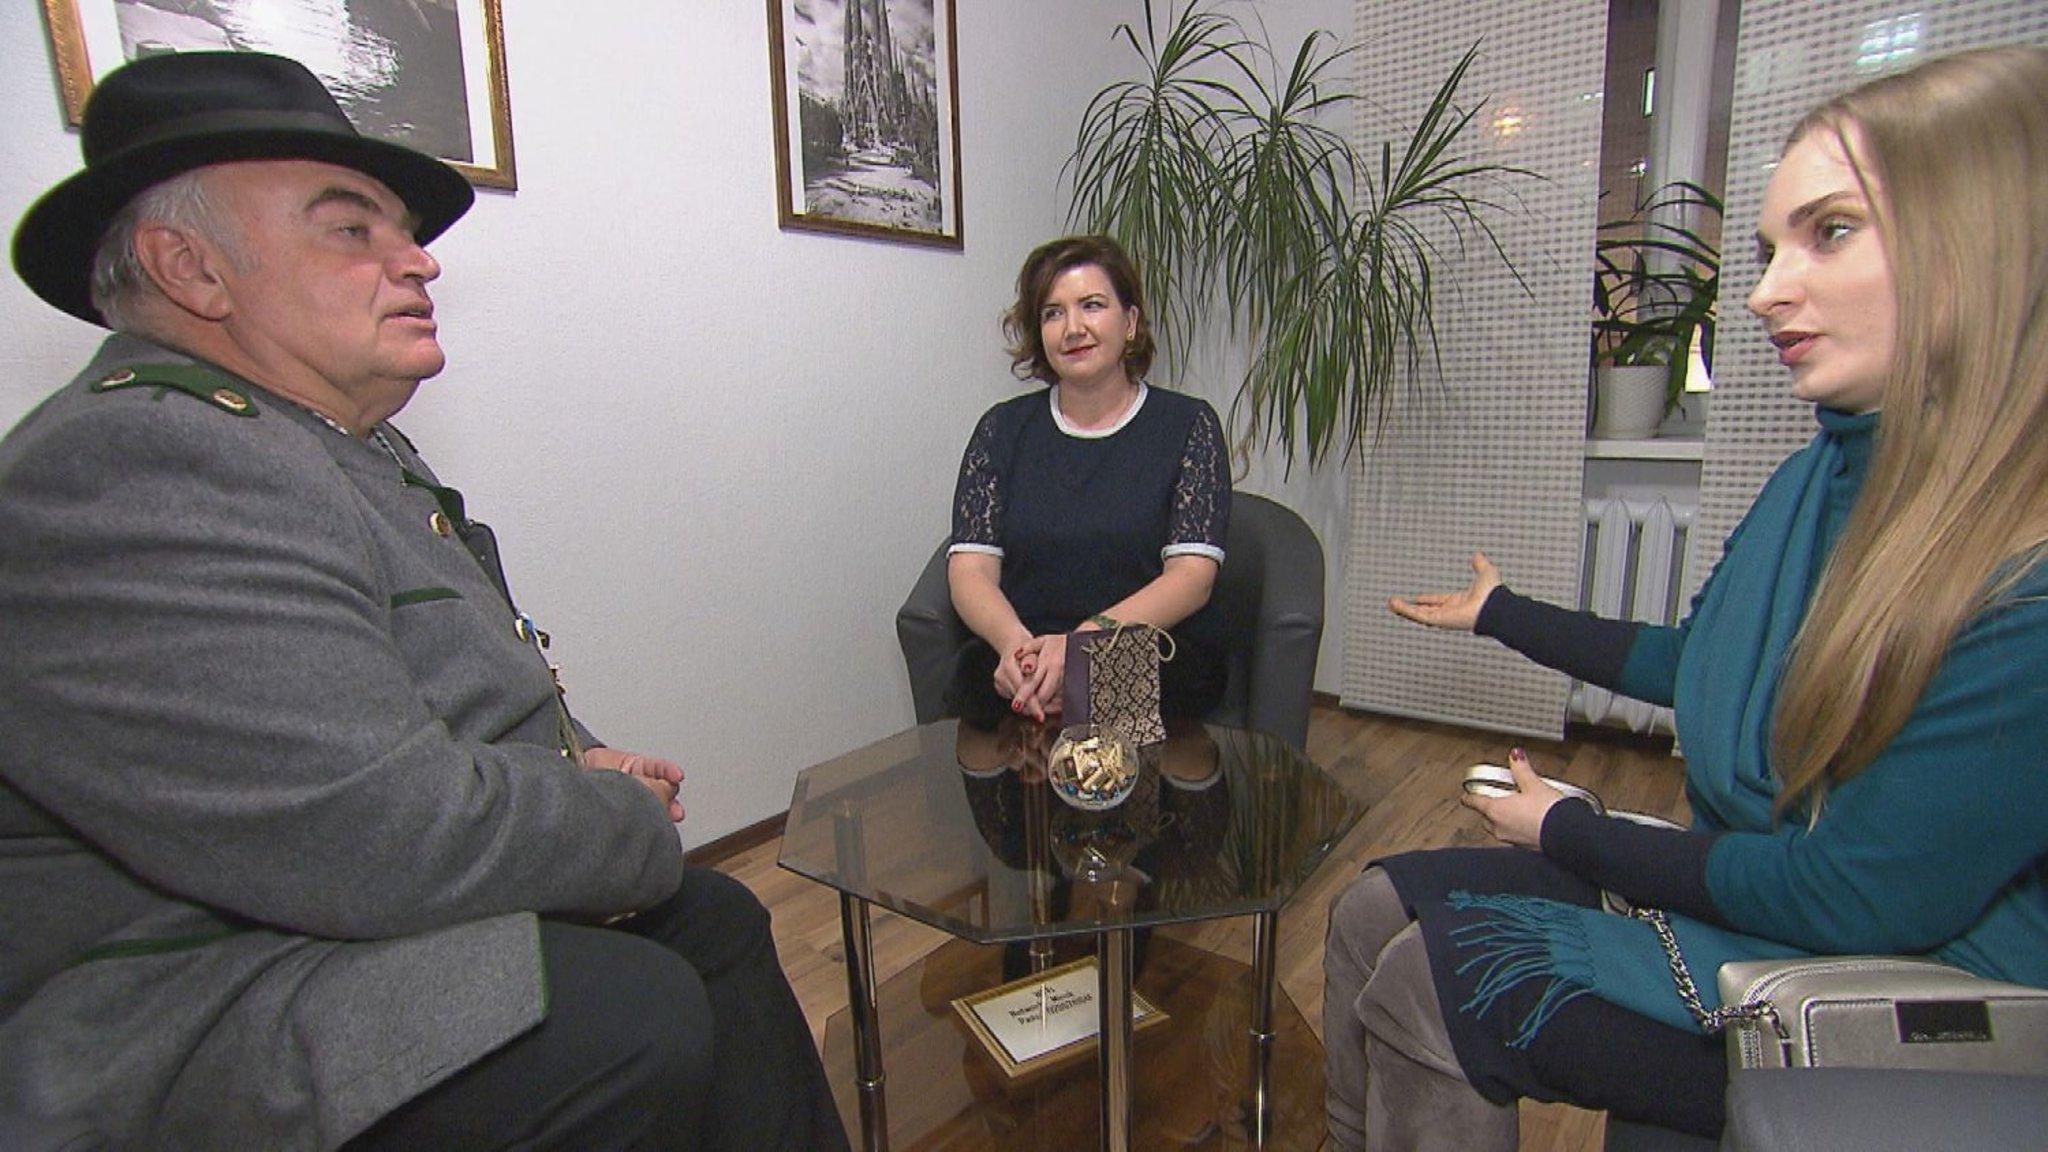 Kostenlose Fickkontakte Sieghartskirchen Wagna - Bi Frau